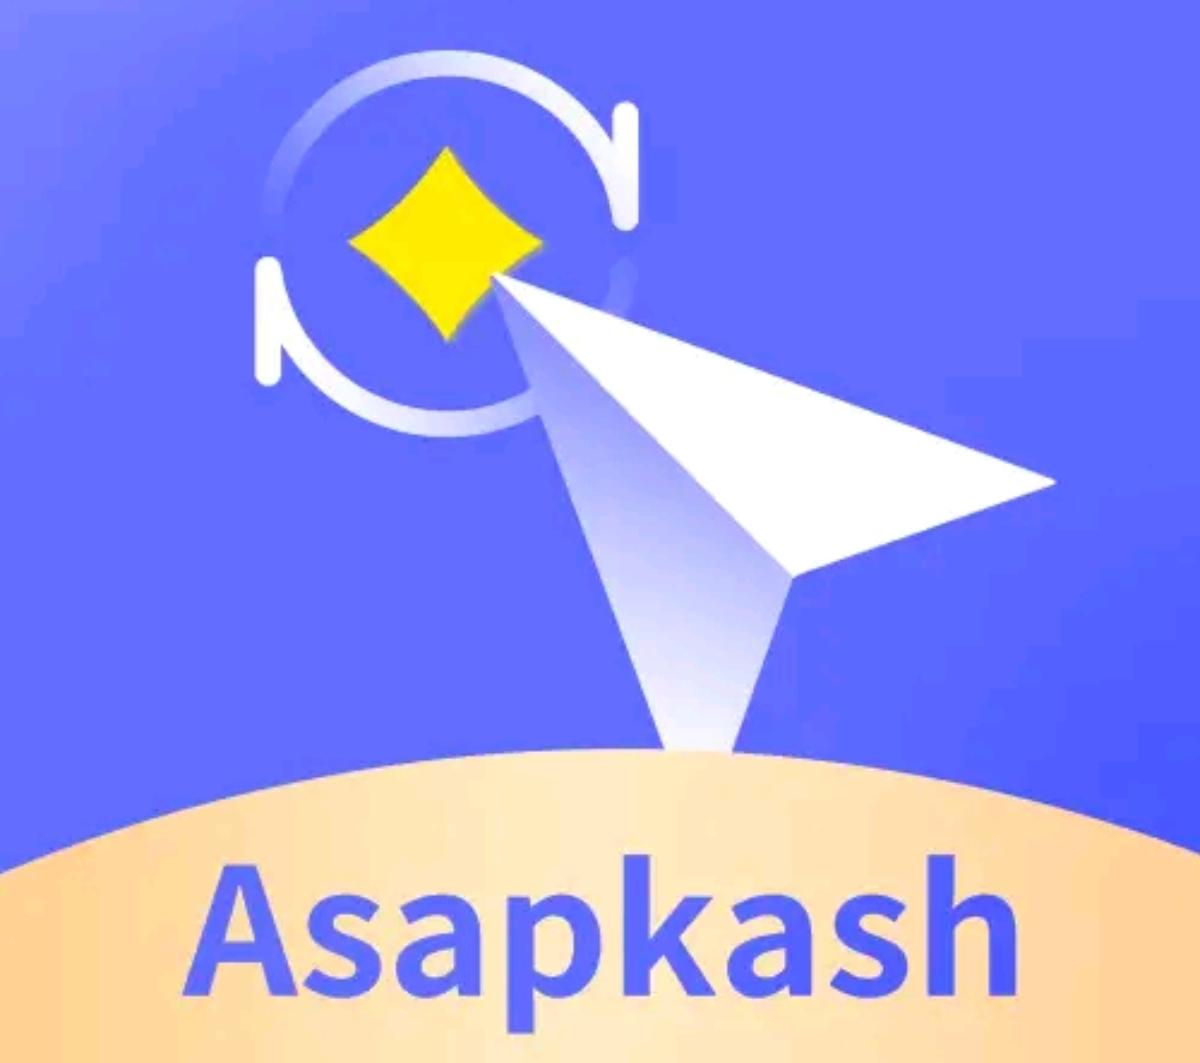 AsapKash loan app